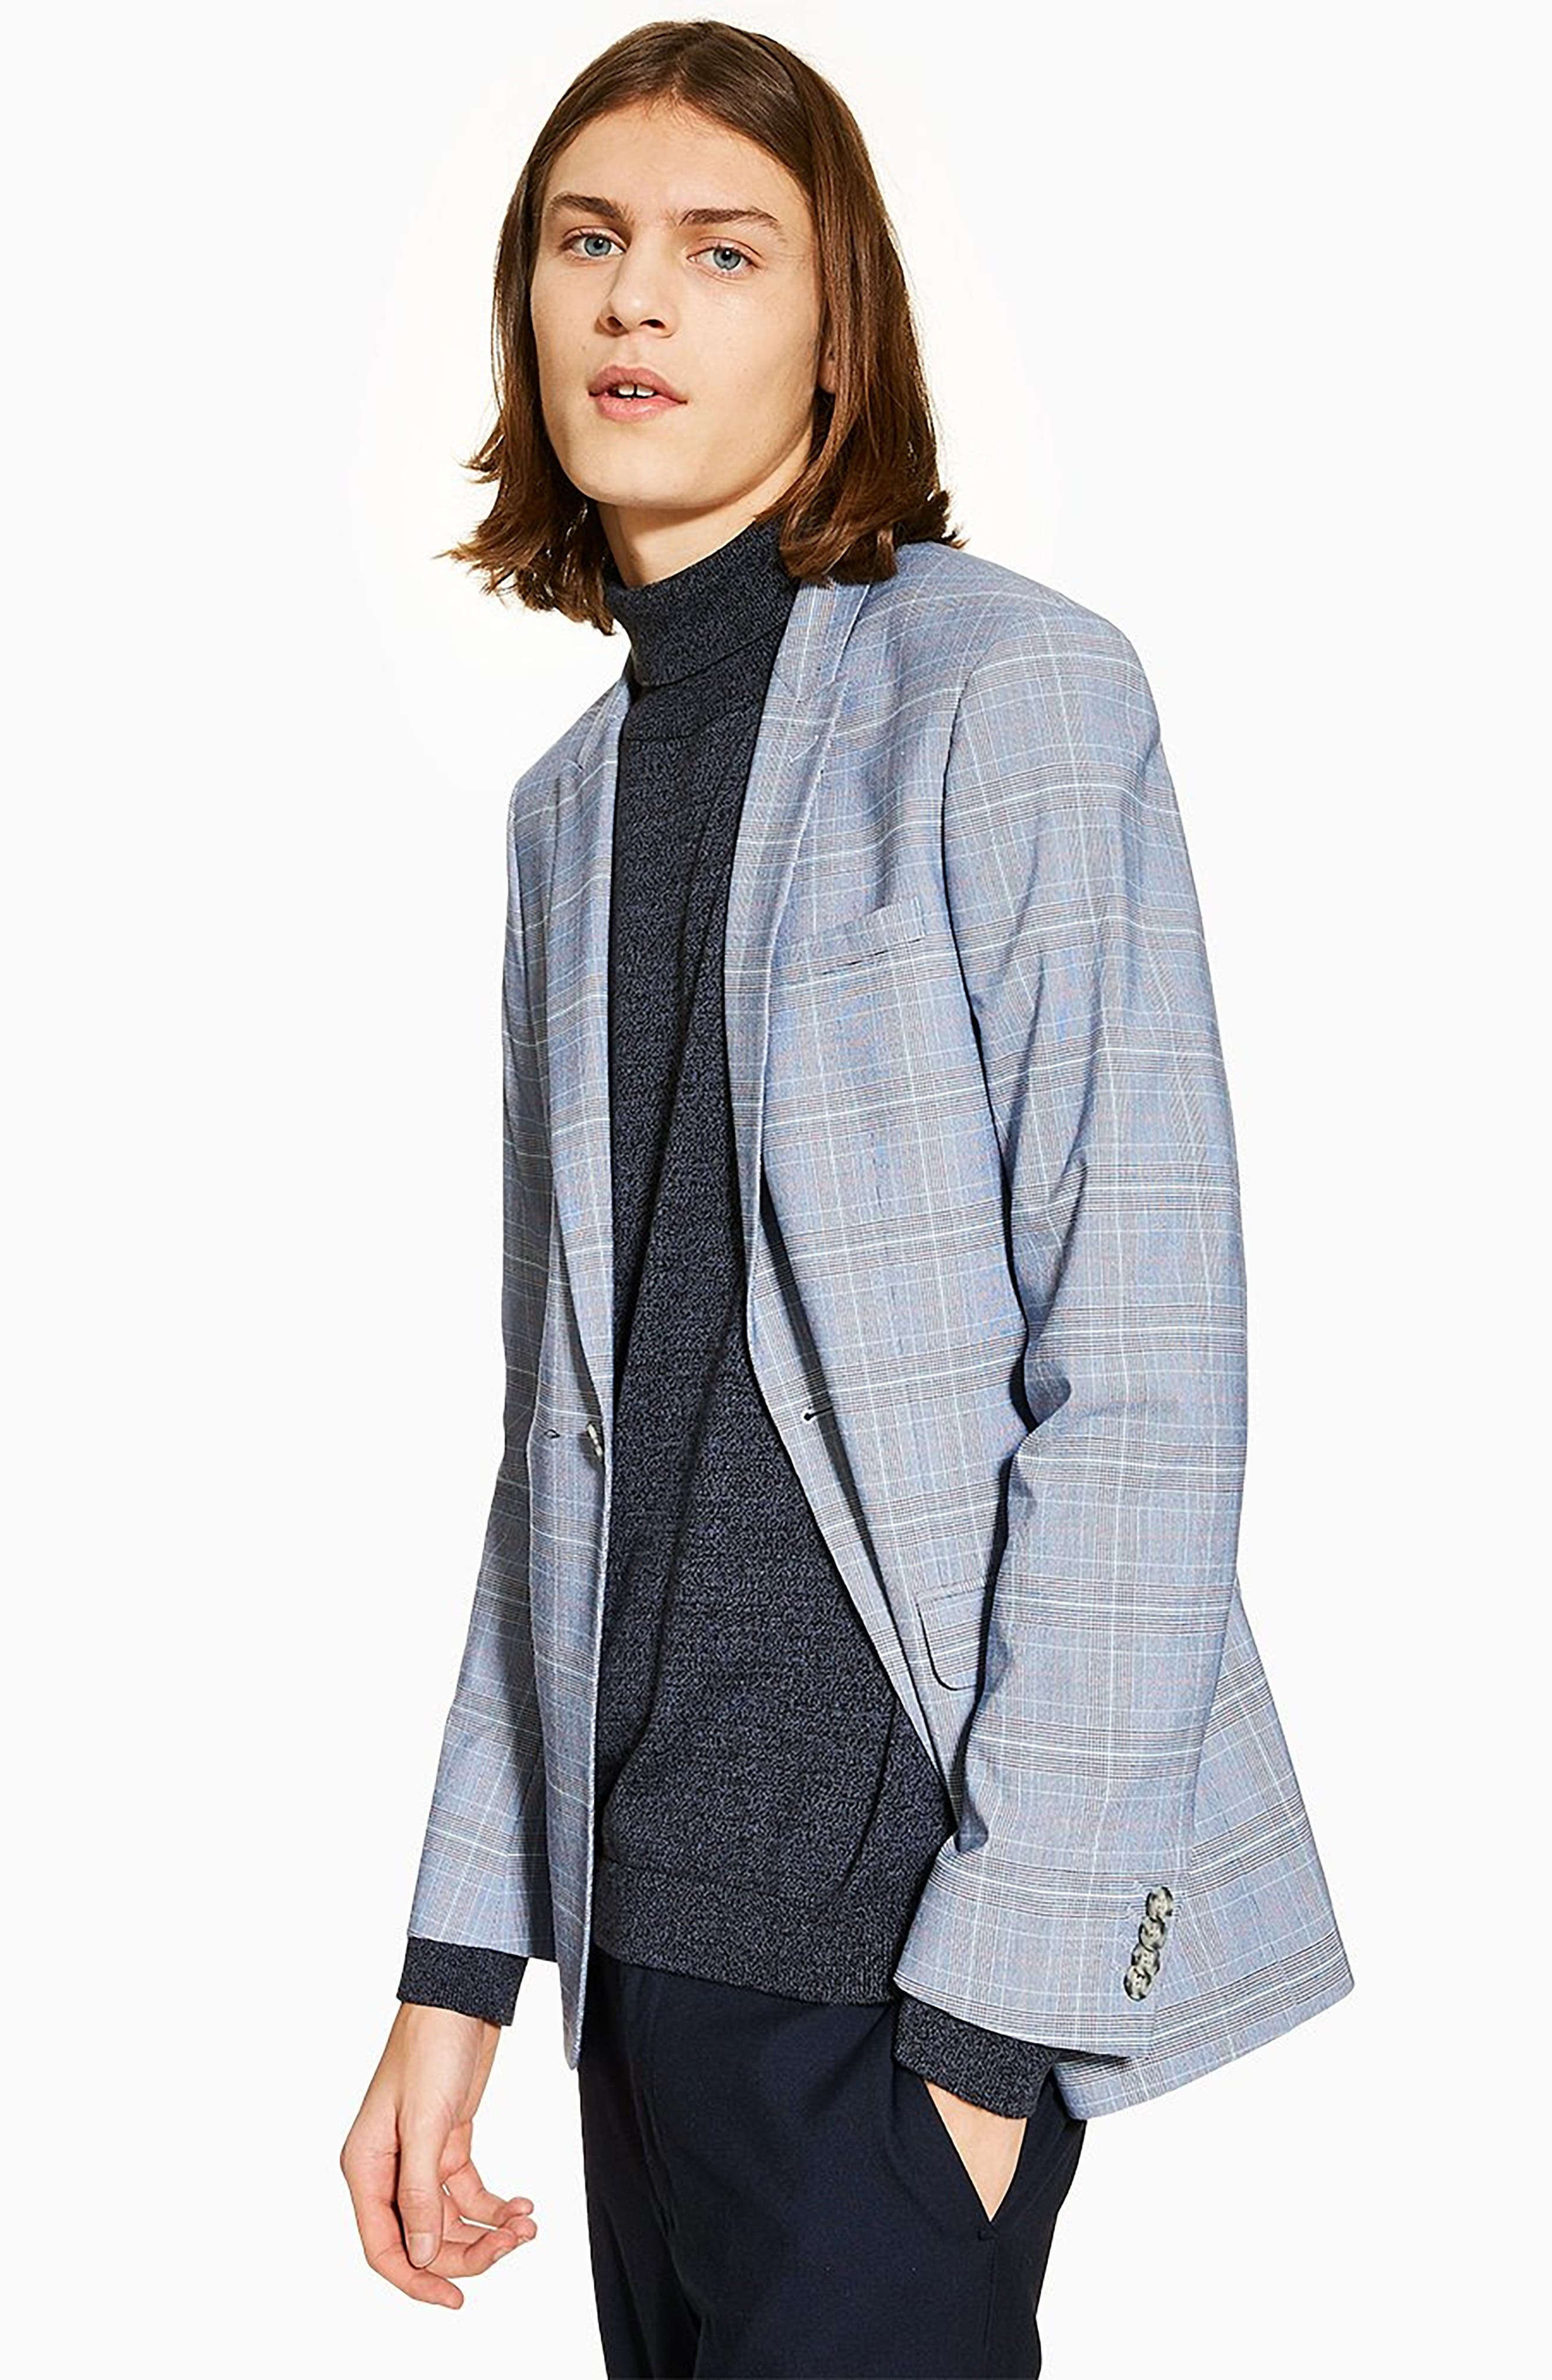 TOPMAN, Skinny Fit Suit Jacket, Alternate thumbnail 5, color, BLUE MULTI